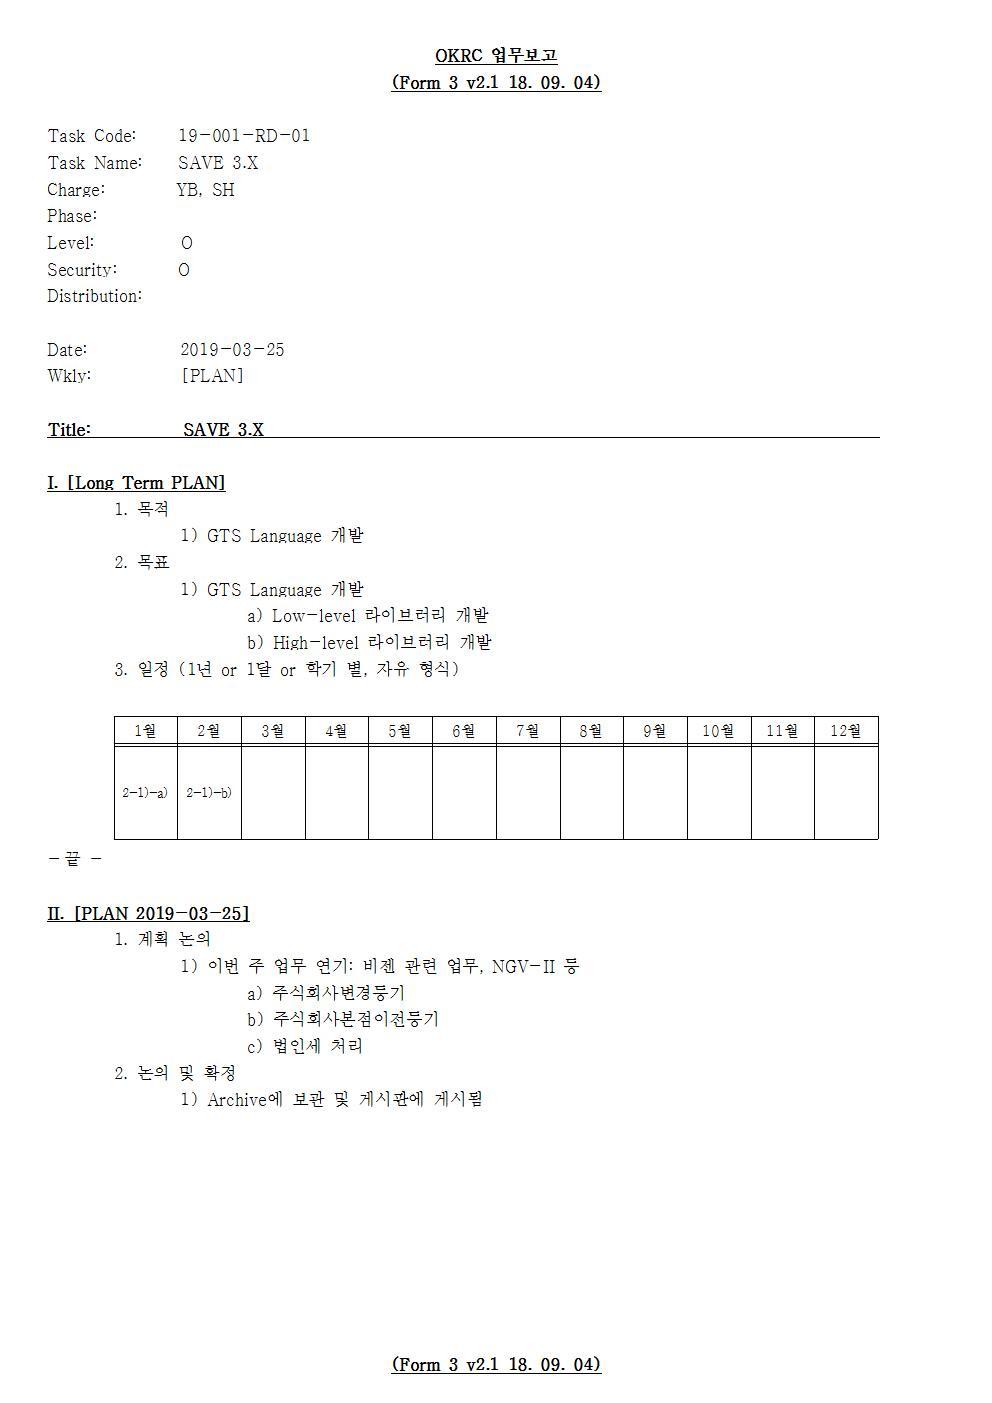 D-[19-001-RD-01]-[SAVE 3.X]-[2019-03-25][SH]001.jpg